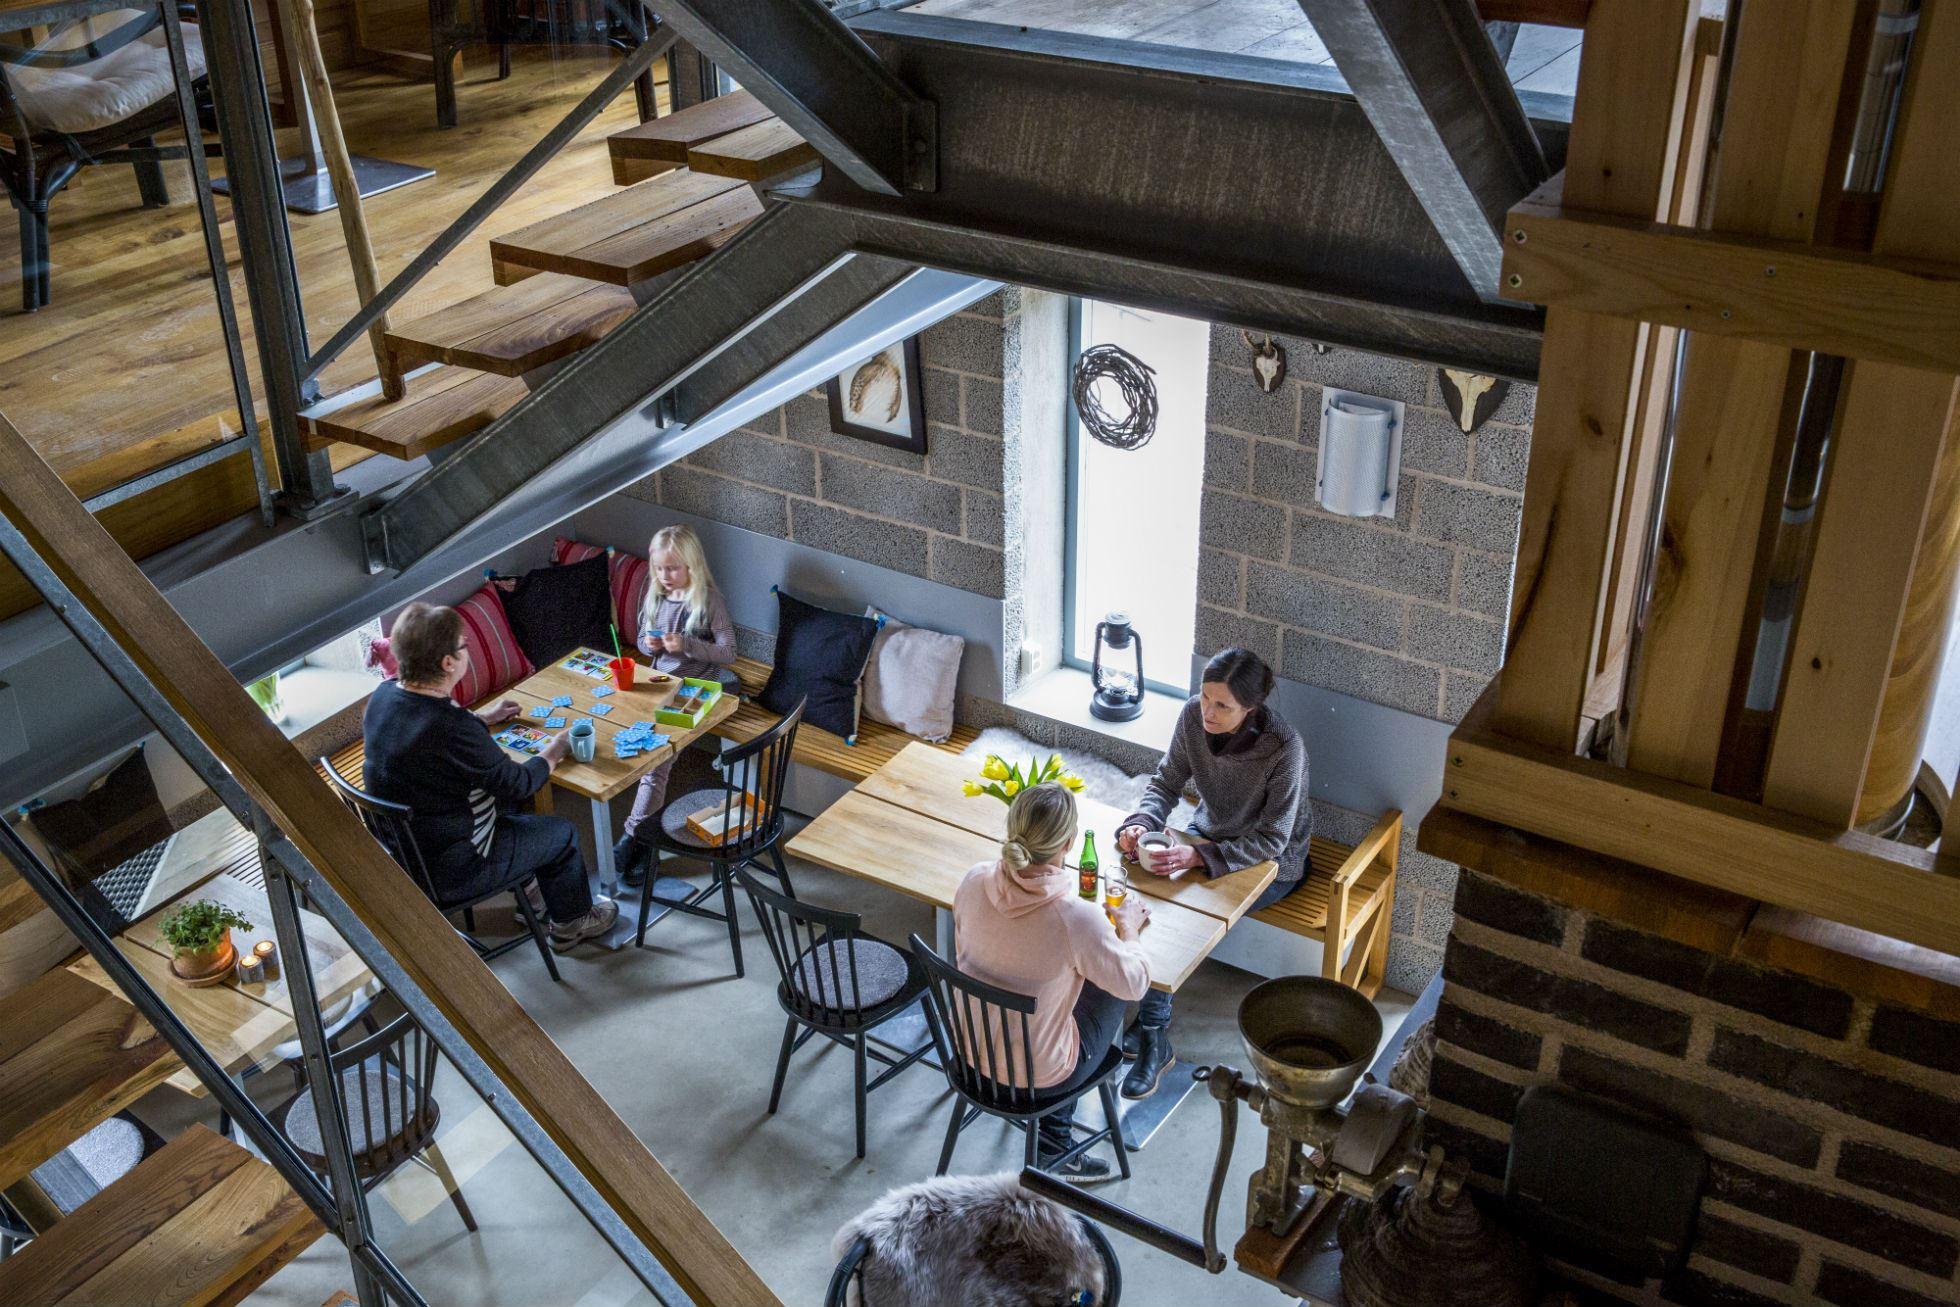 Fulltofta Naturcentrums café